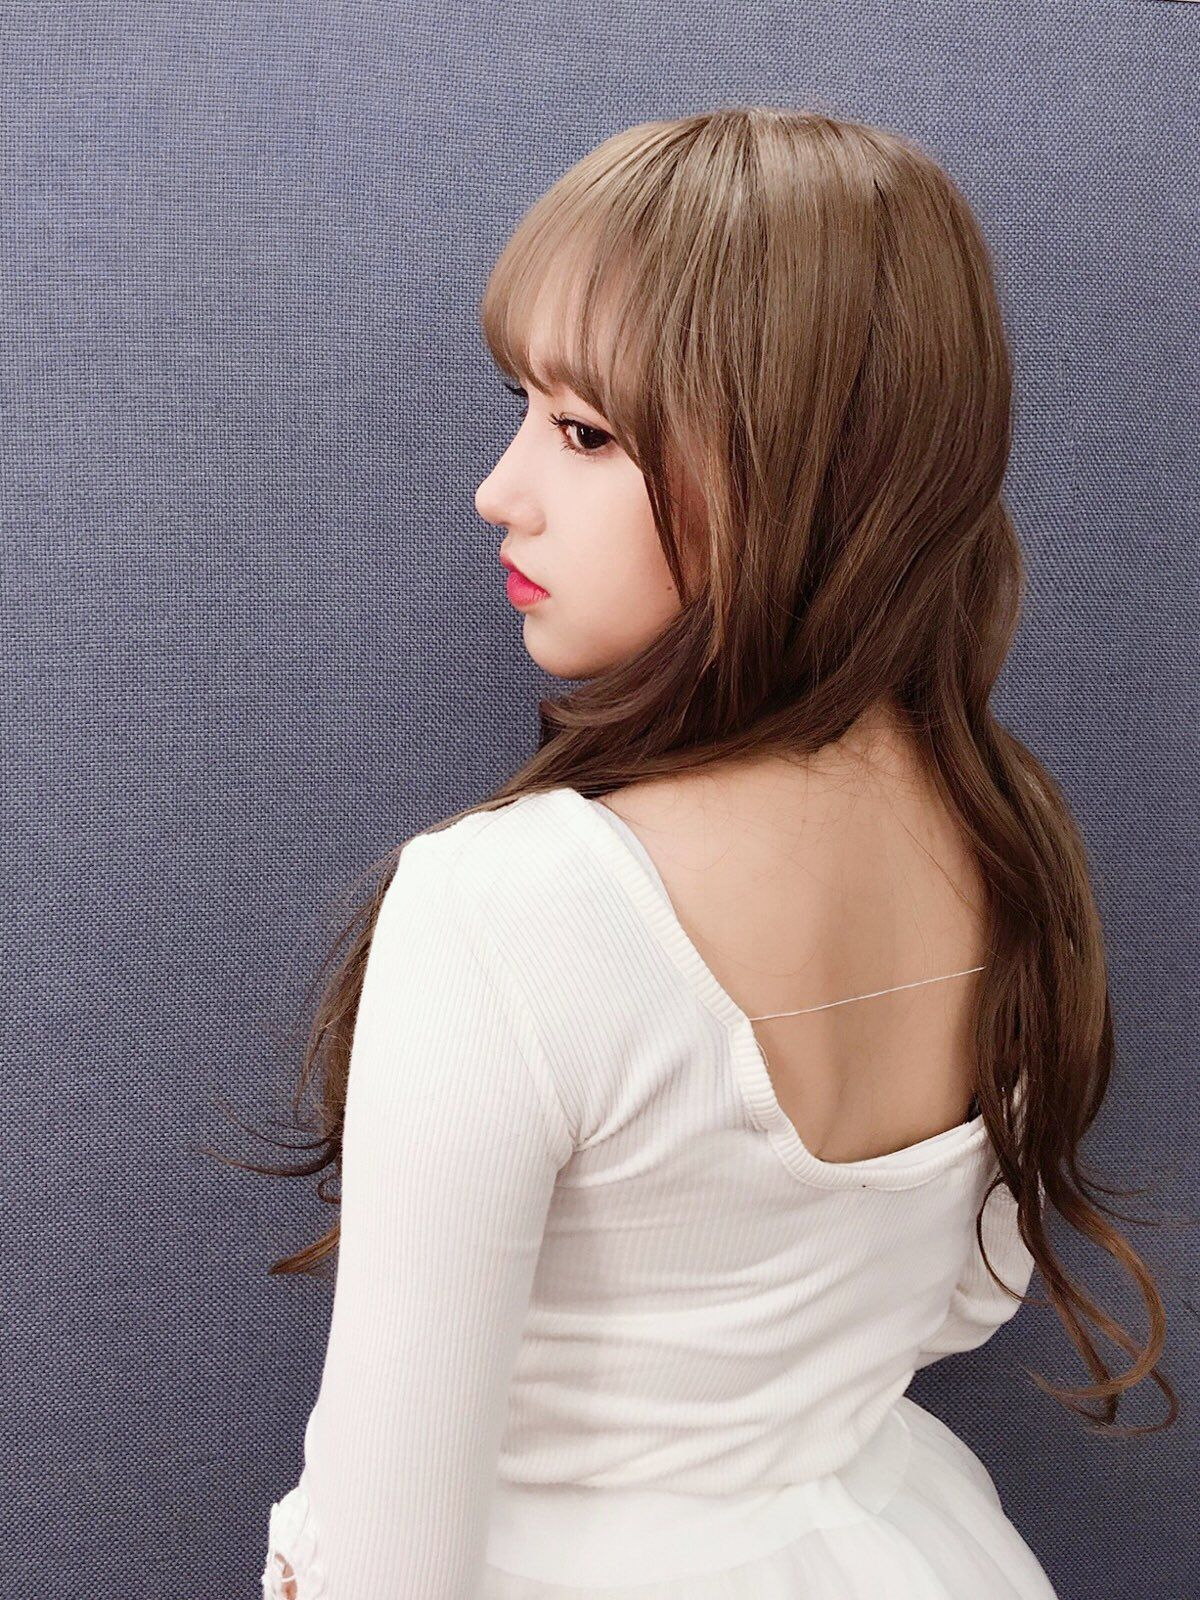 WJSN ChengXiao  #back